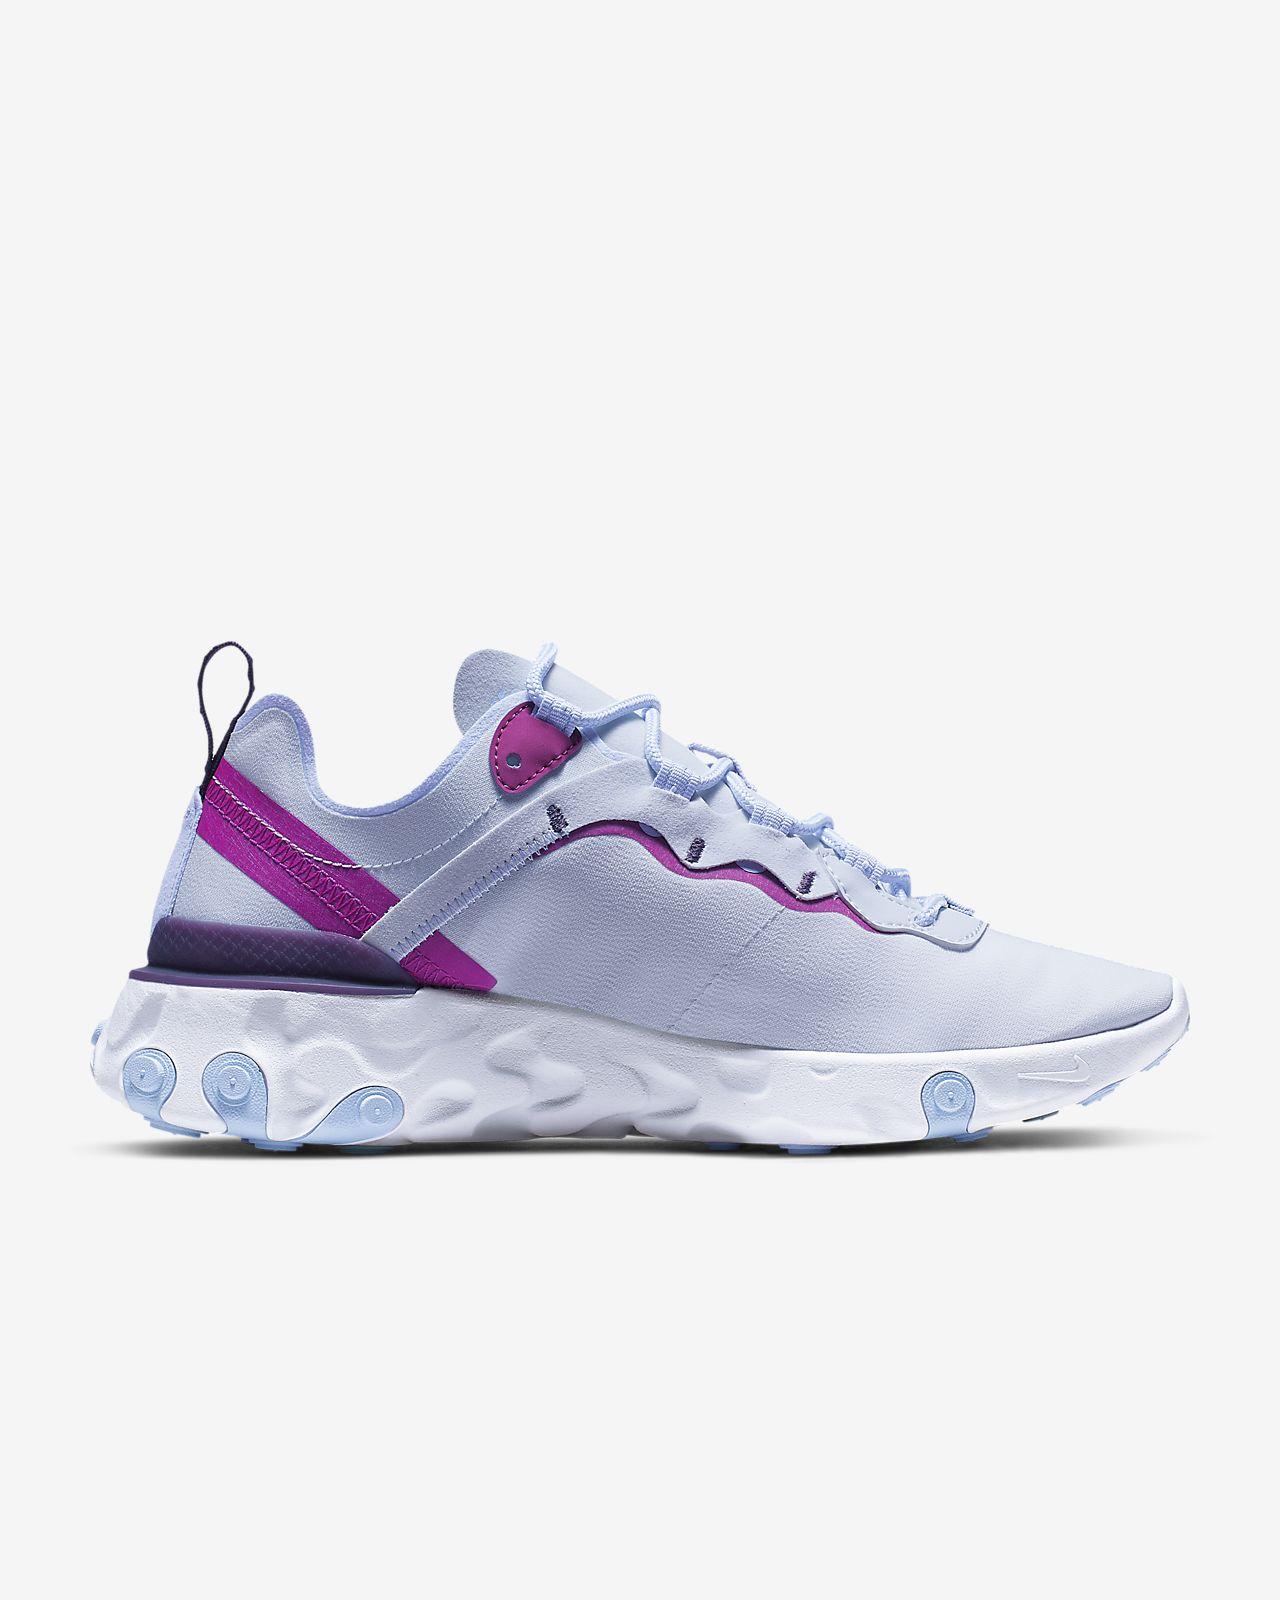 Pour React Nike FemmeFr Chaussure Element 55 nvN80wm